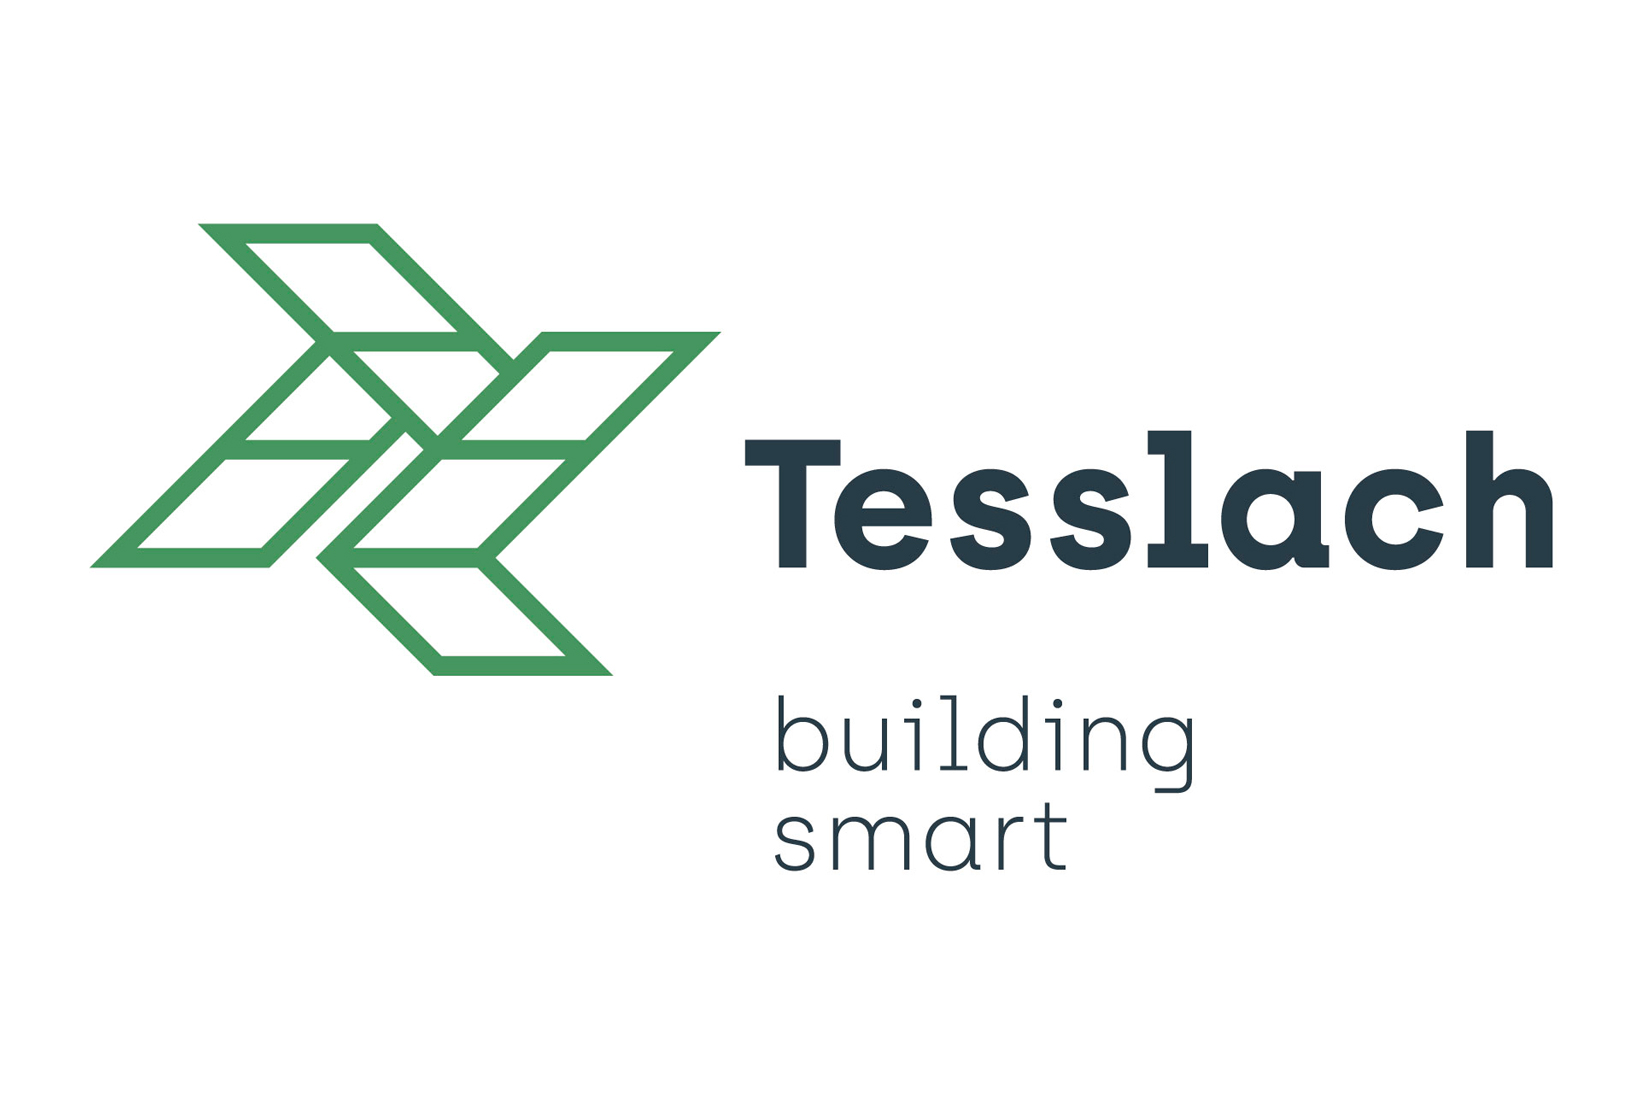 Tesslach branding logo identitat corporativa disseny gràfic Vibranding